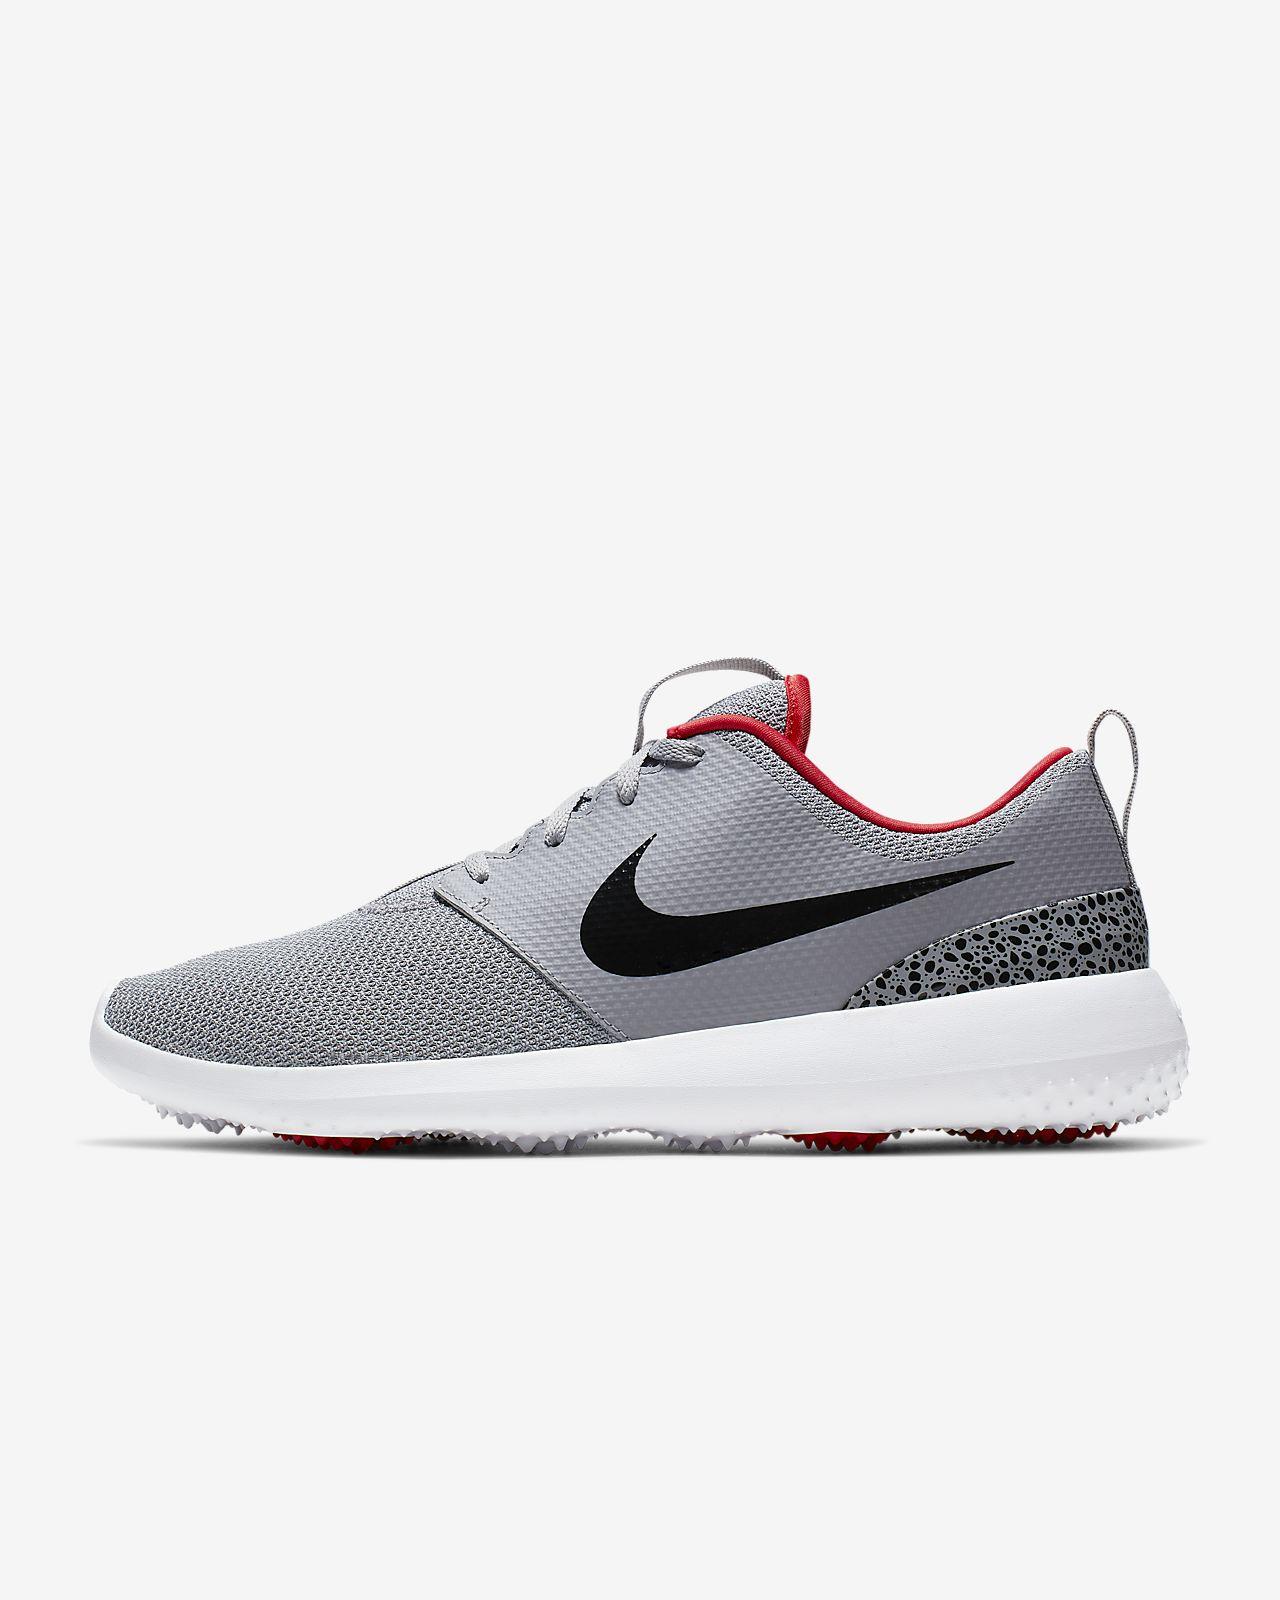 outlet store e5703 265b3 Męskie buty do golfa Nike Roshe G. Nike.com PL